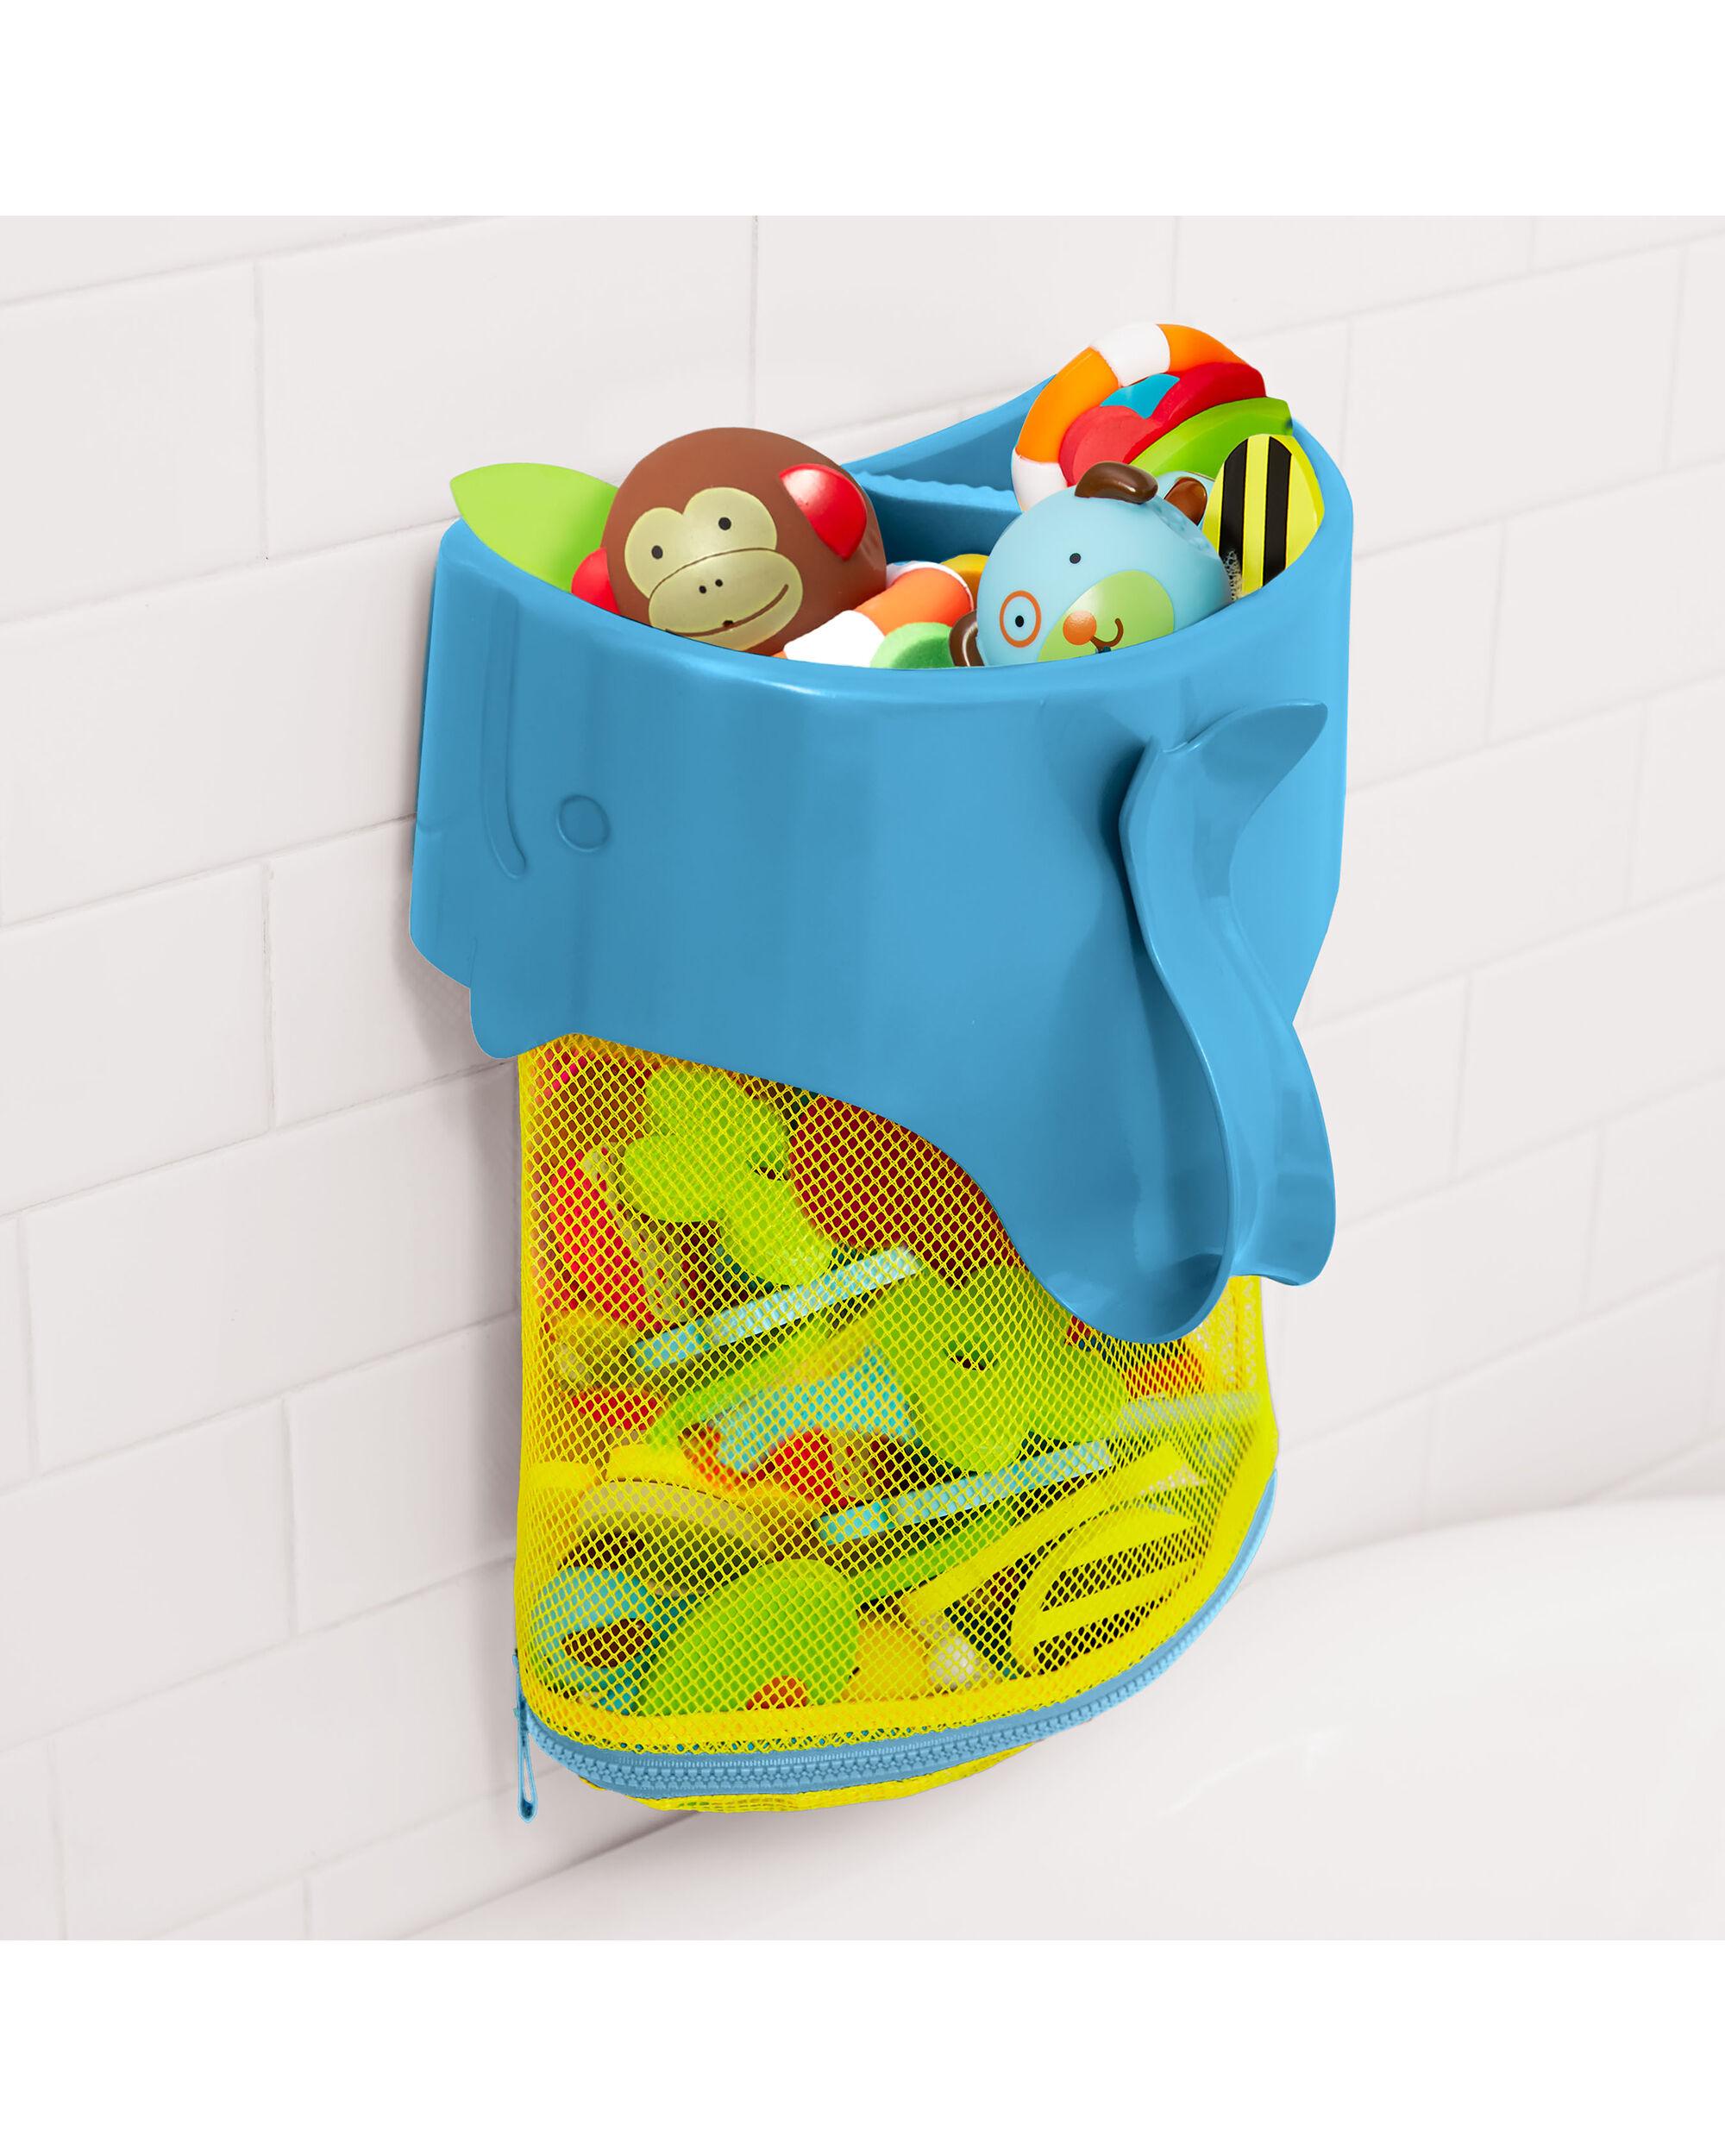 ... Moby Scoop U0026 Splash Bath Toy Organizer ...